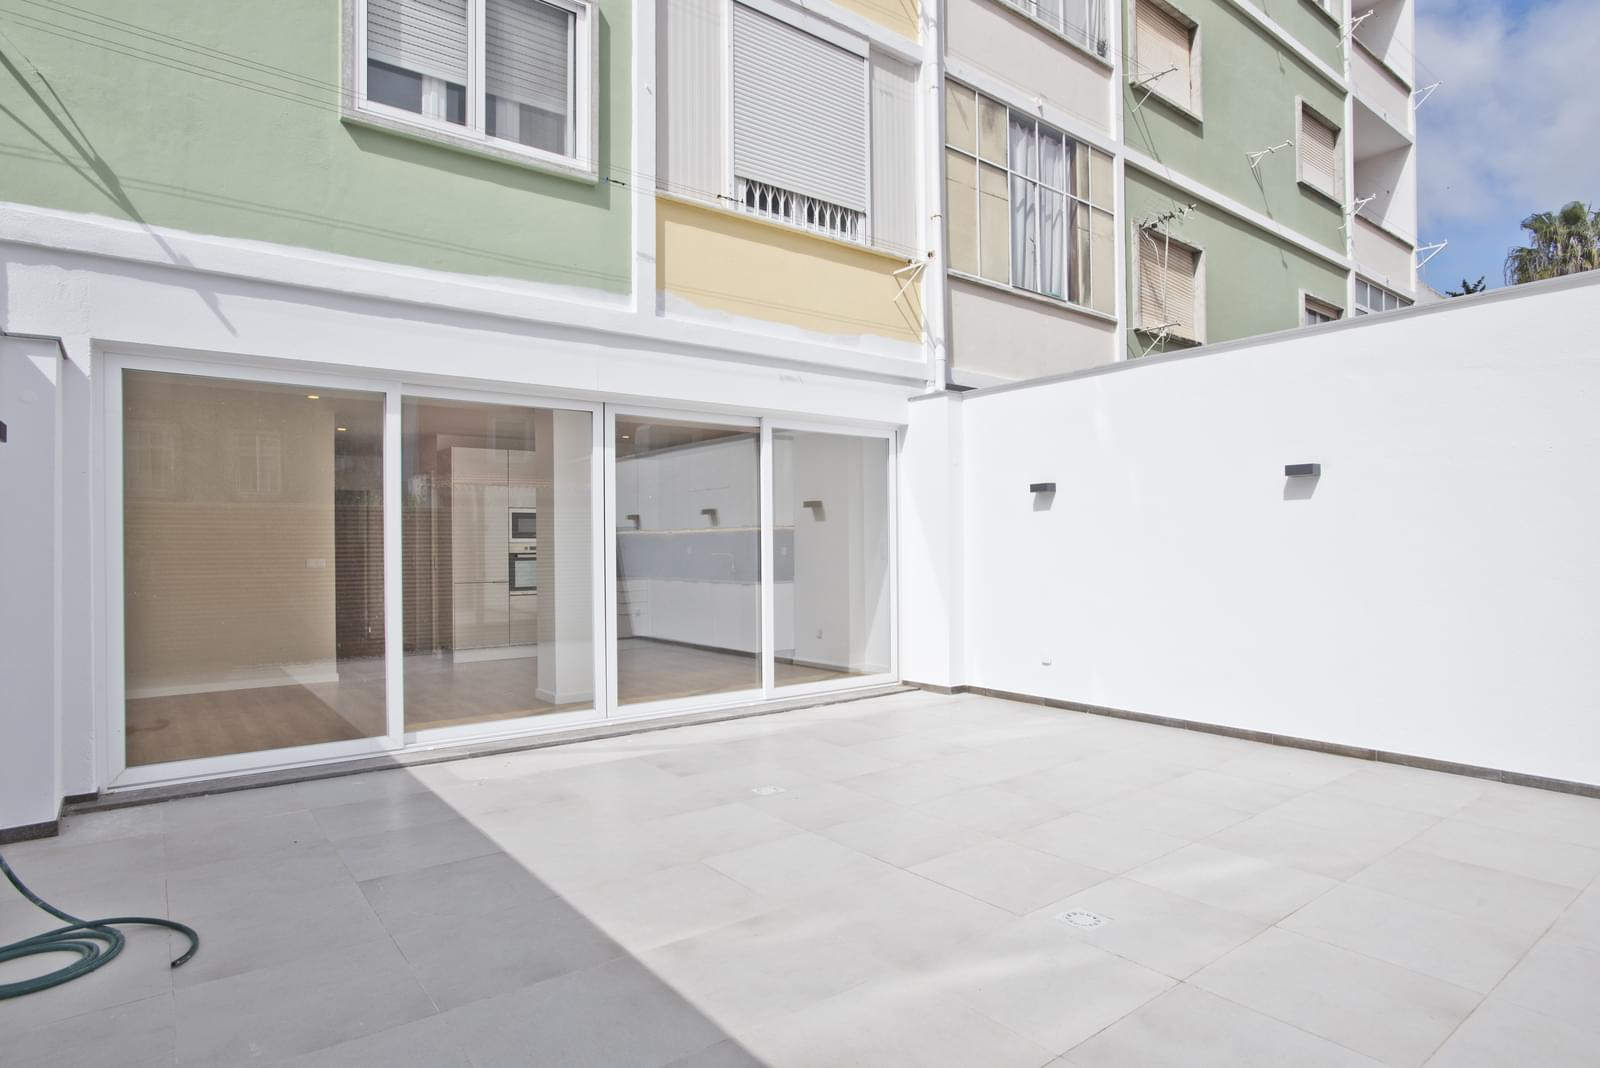 pf16986-apartamento-t2-cascais-d4b3e7f3-f0d0-4a01-85cf-c729b25d4bf8